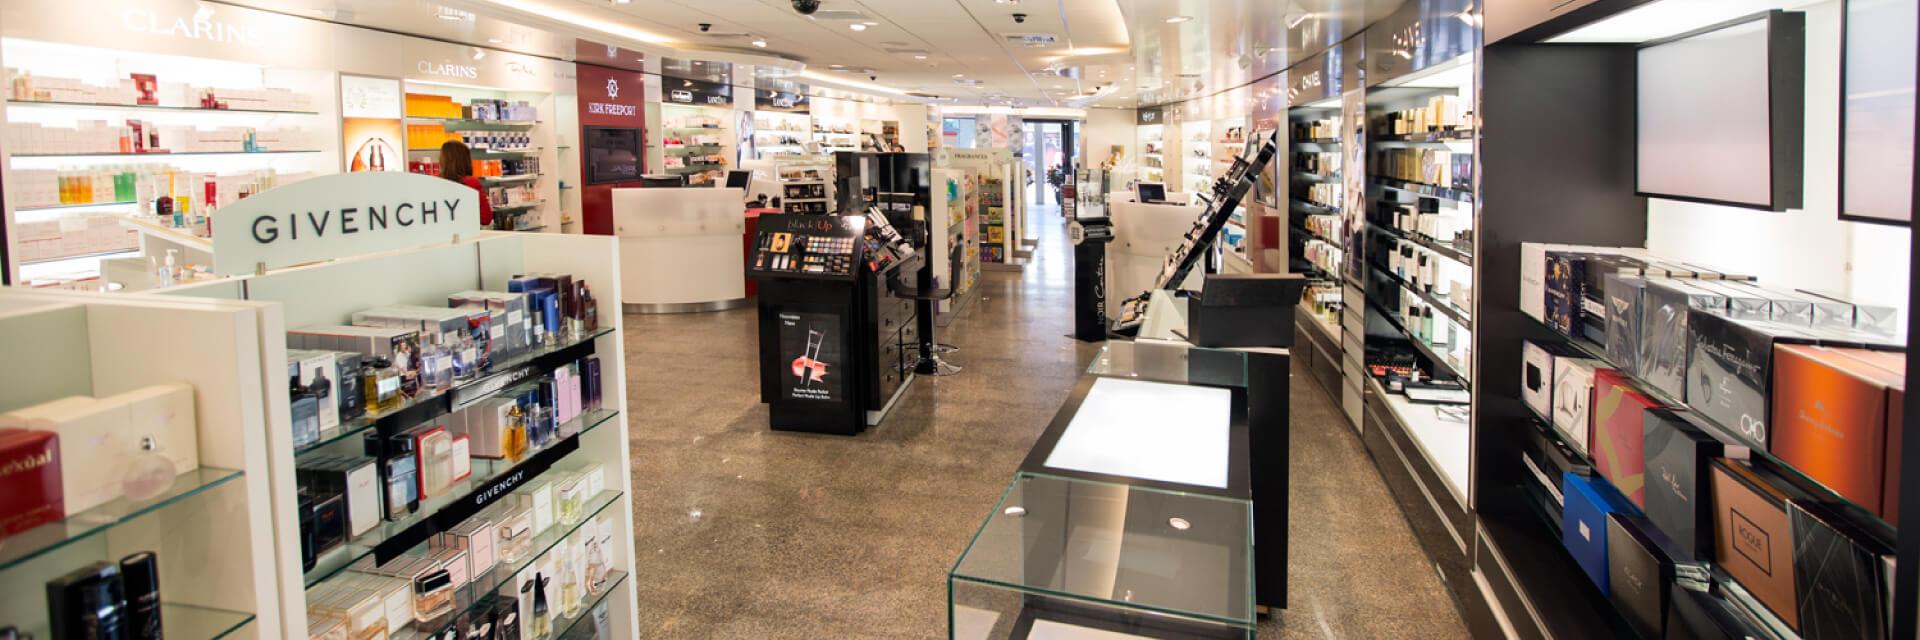 Kirk Freeport presents La Parfumerie Duty-free beauty retailer on Cardinal Avenue, George Town in the Grand Cayman Islands